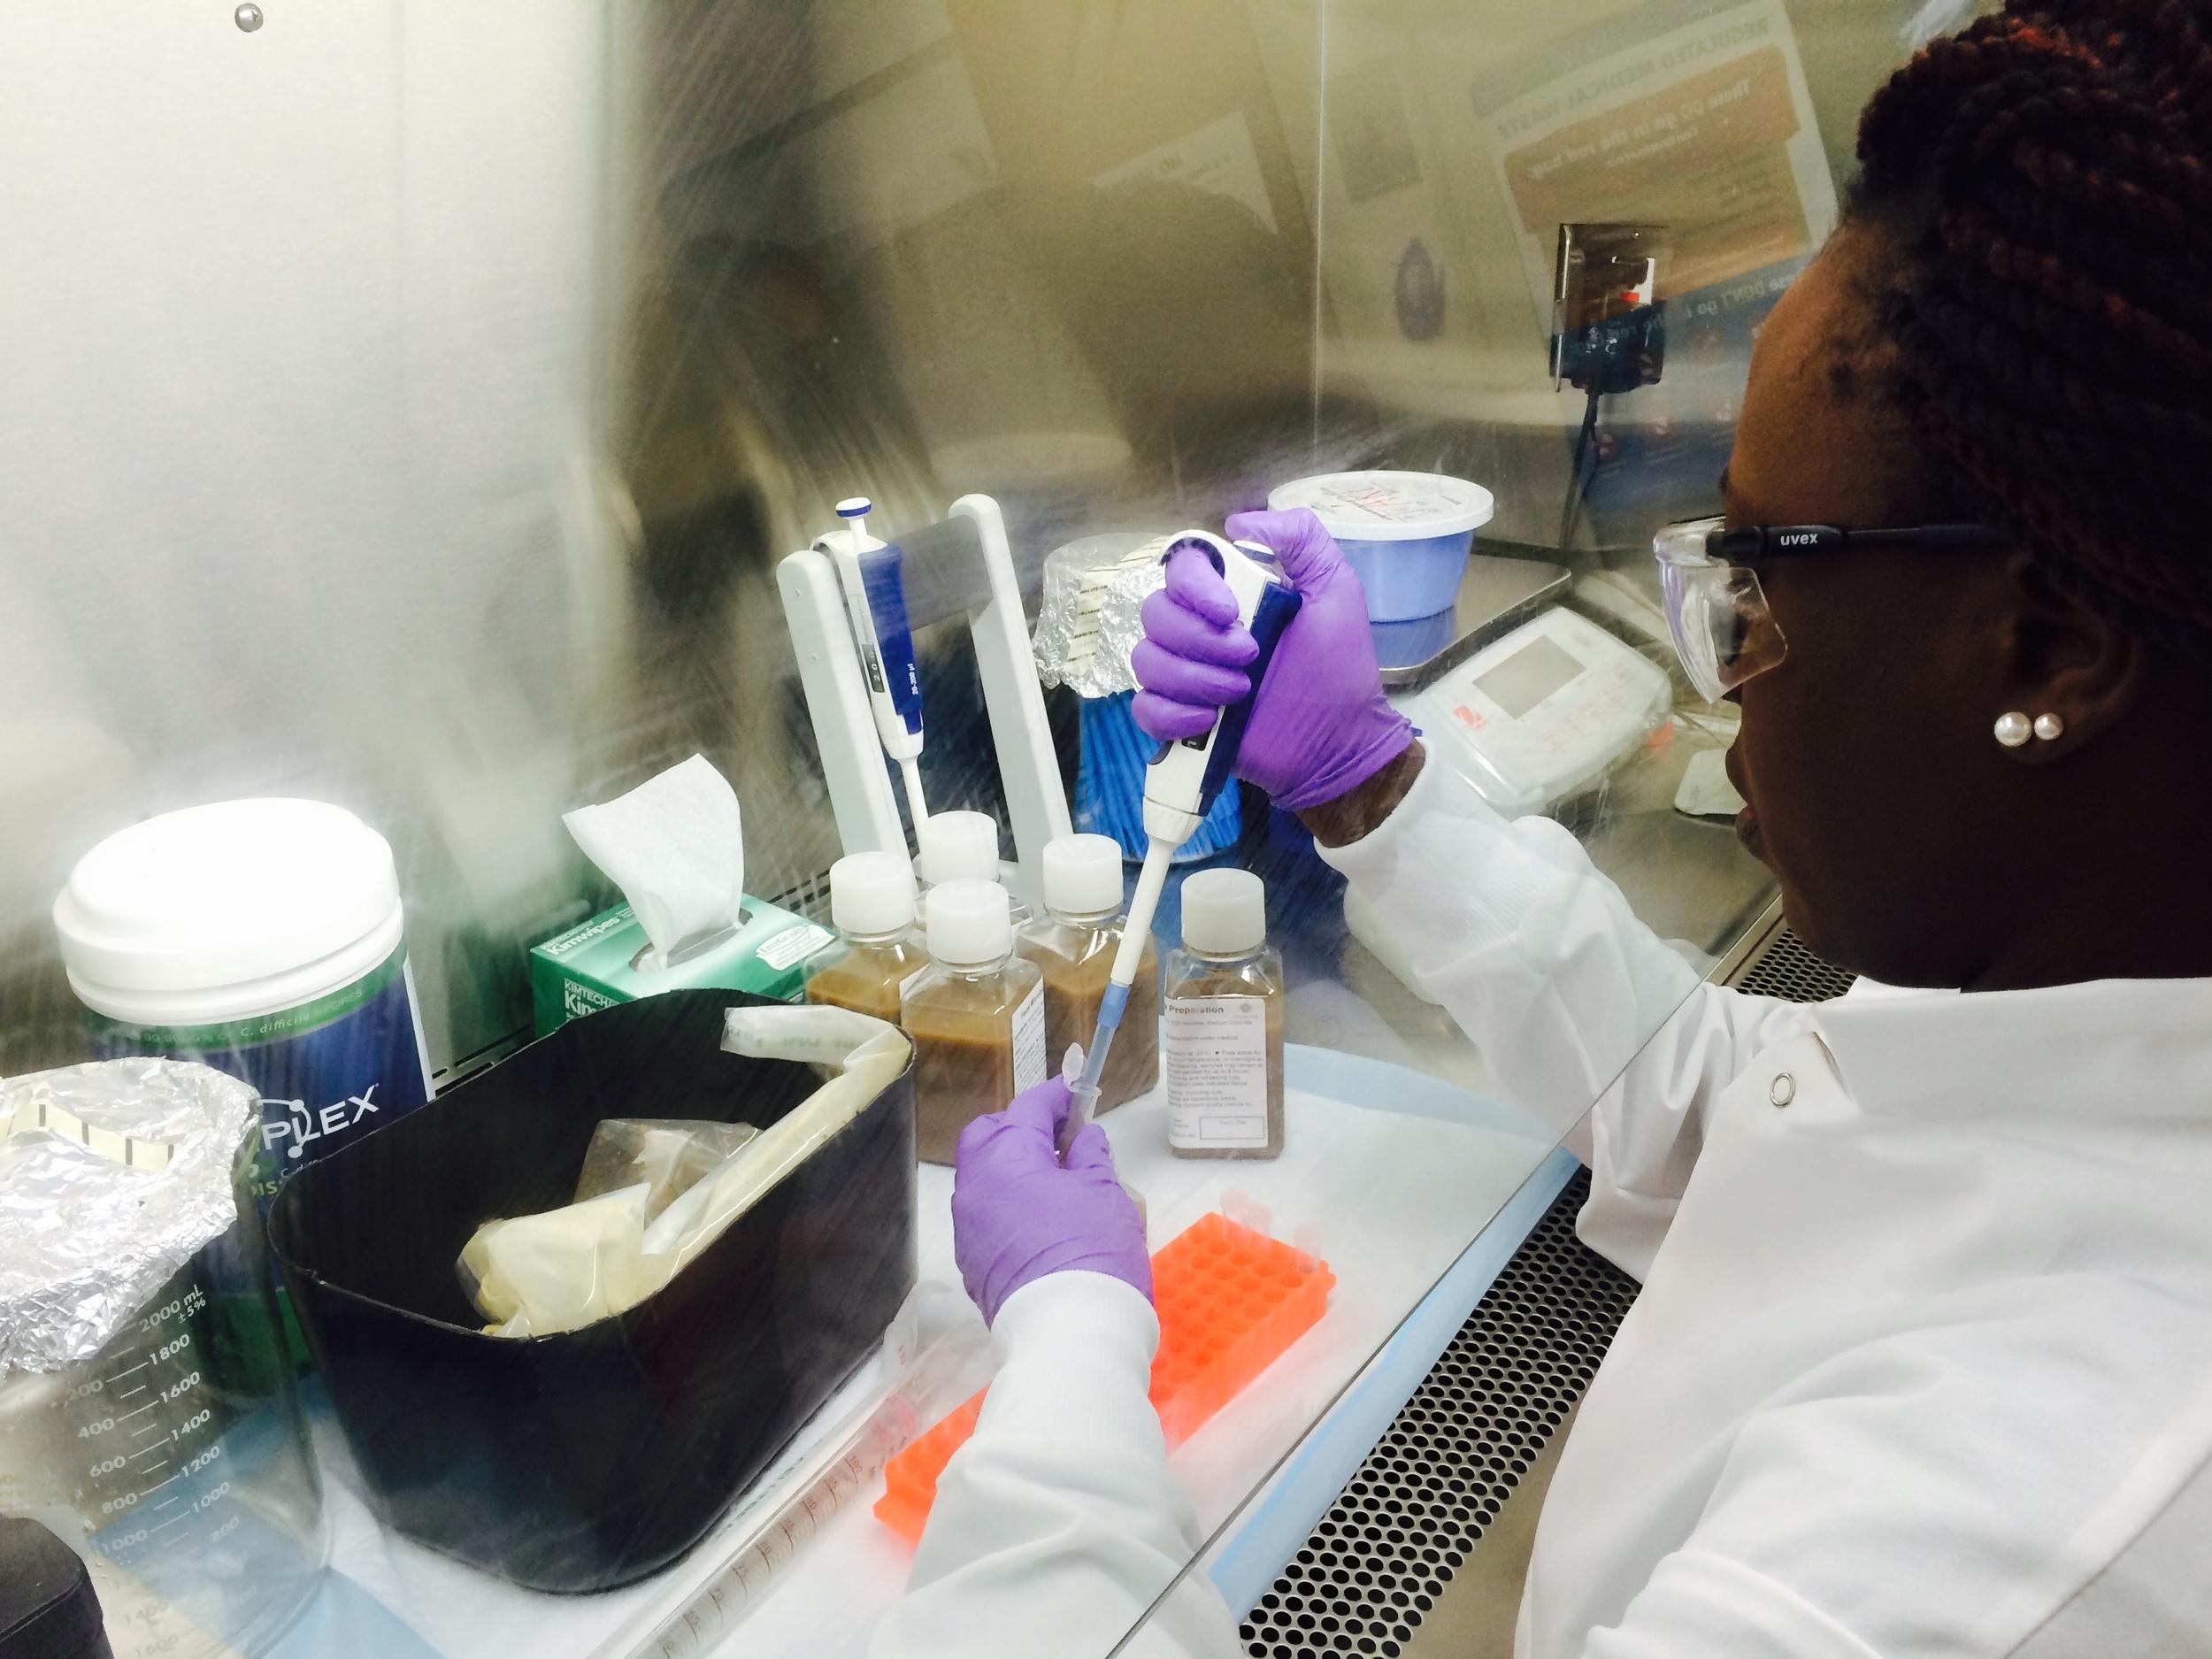 Inside OpenBiome: Mary Njenga processing samples